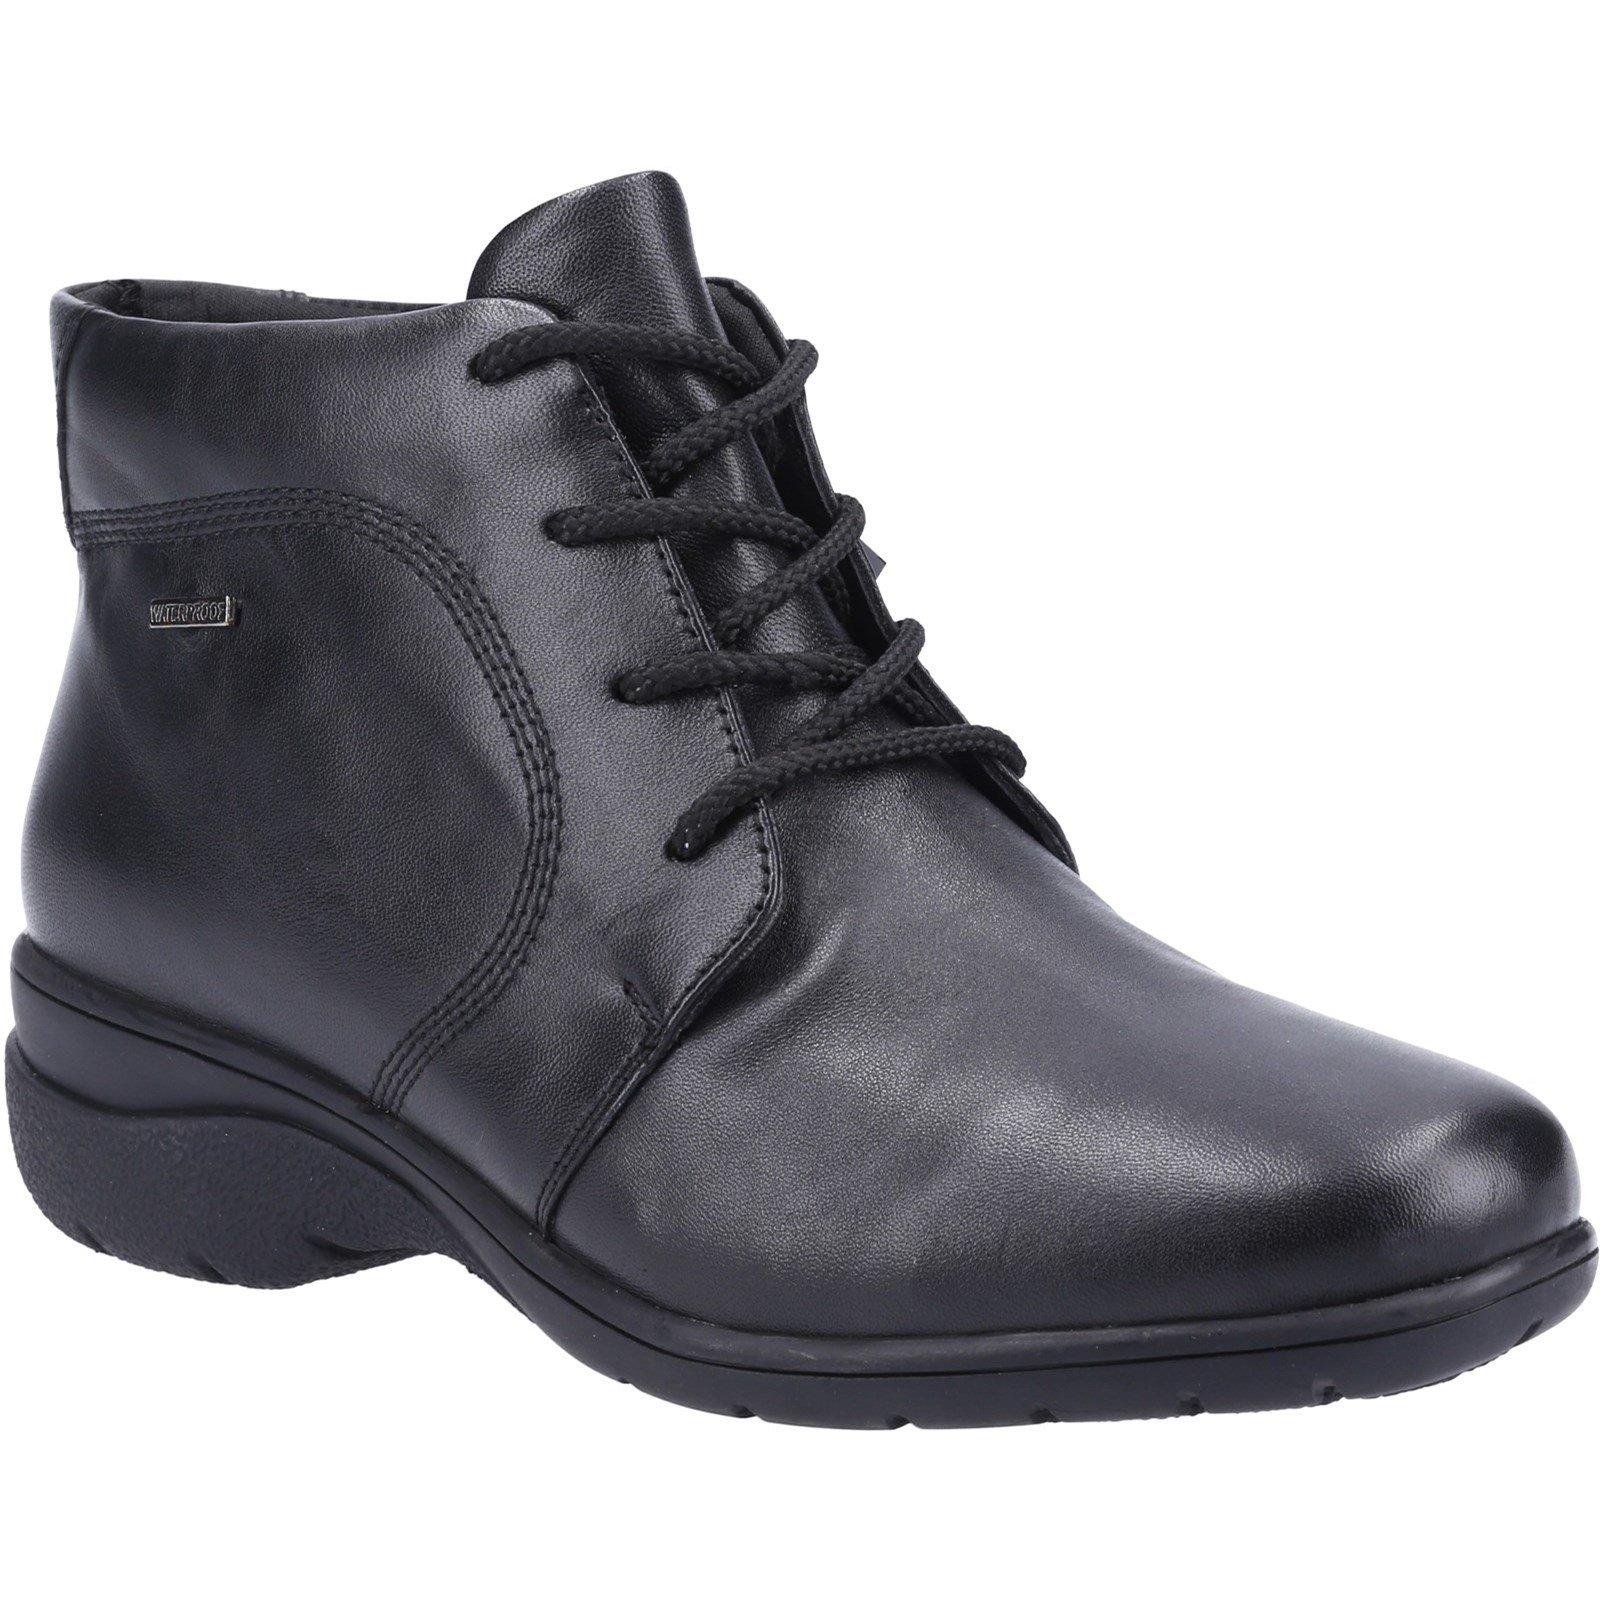 Cotswold Women's Bibury 2 Ankle Boot Black 32978 - Black 5